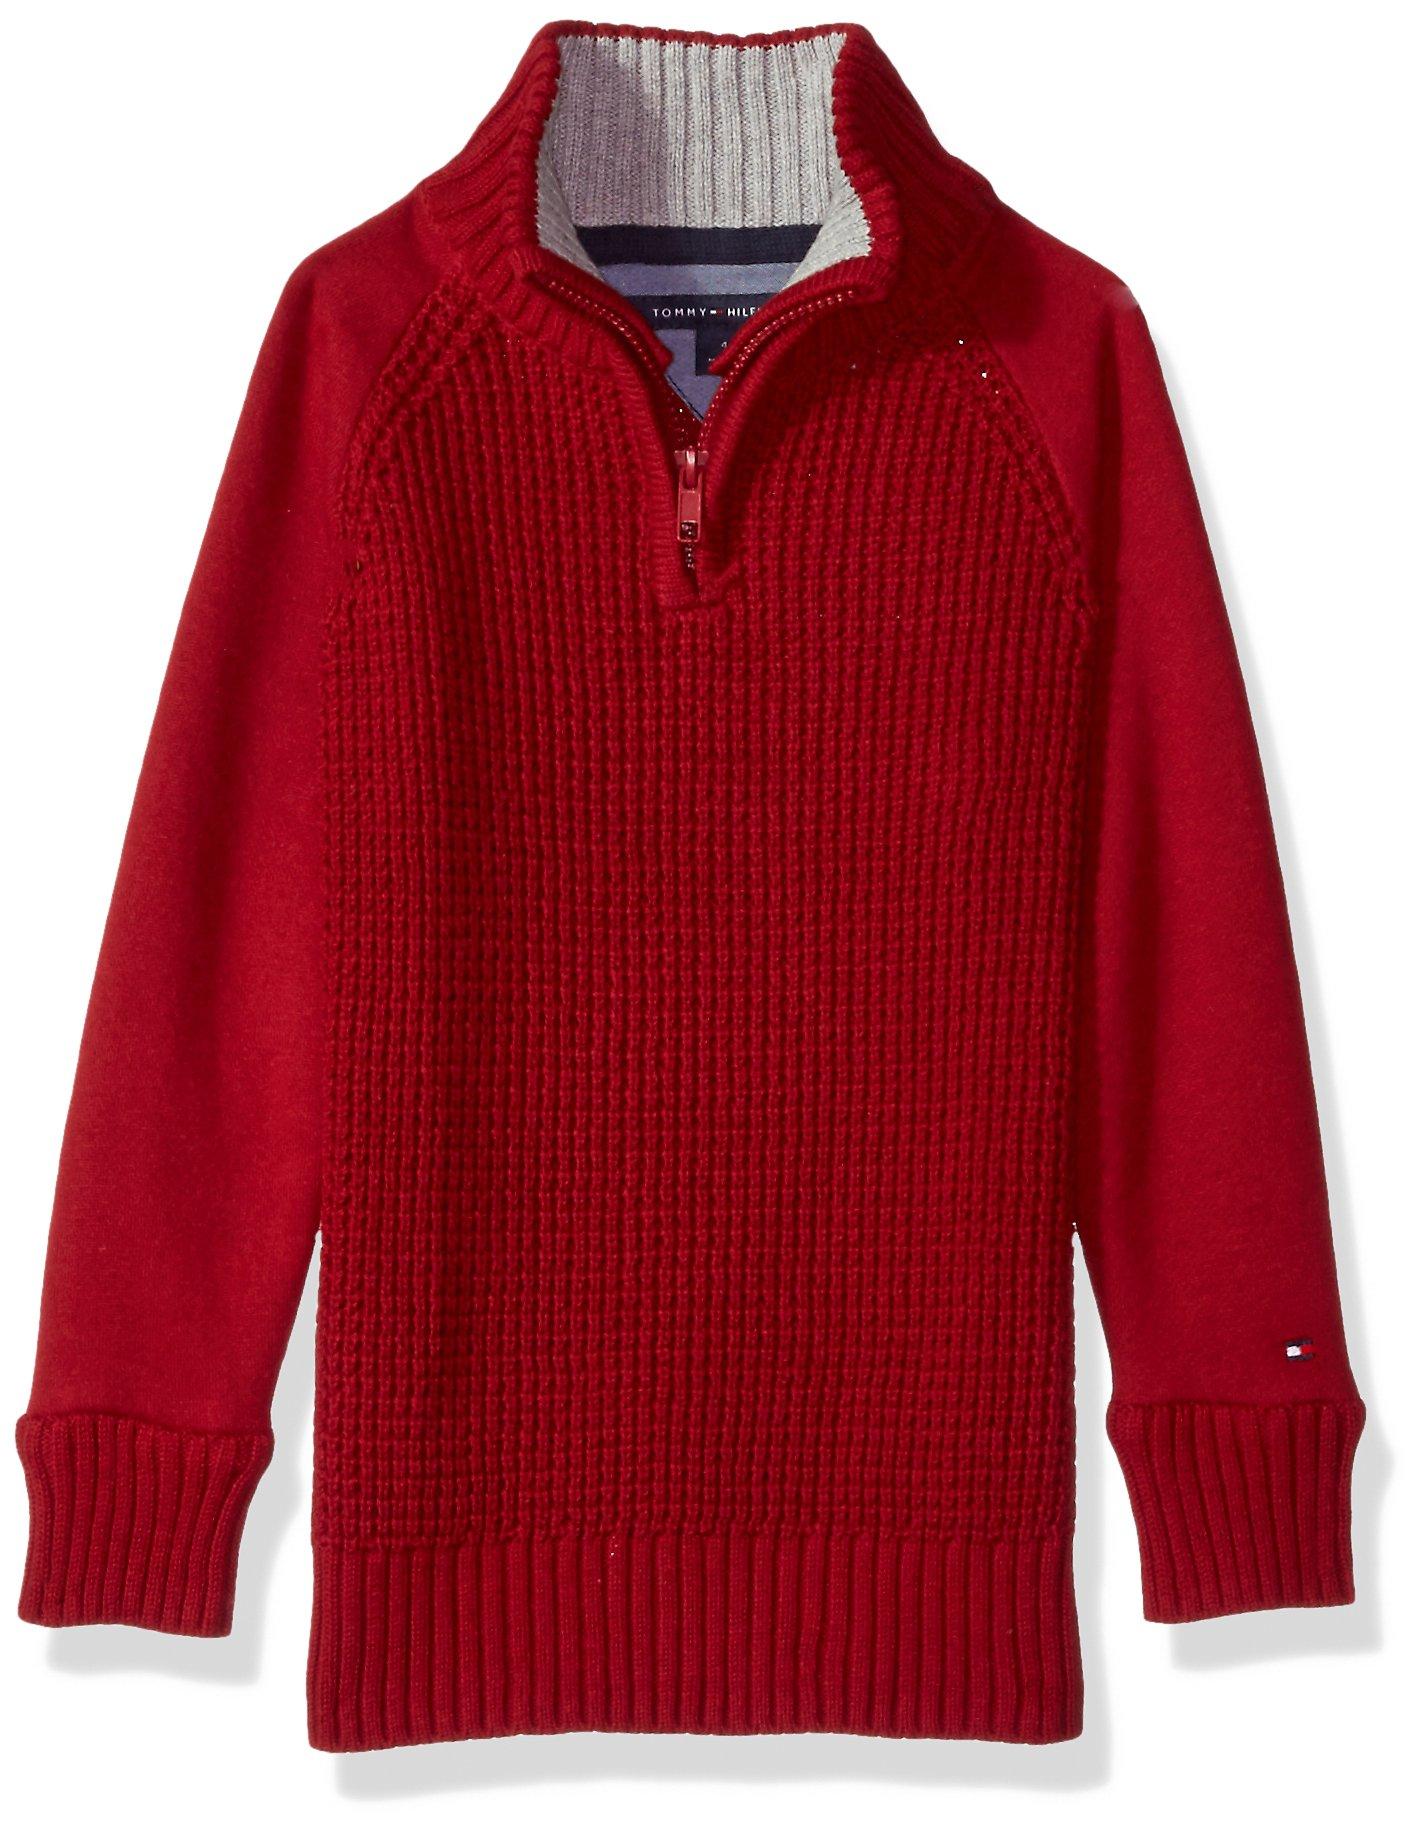 Tommy Hilfiger Boys' Big Long Sleeve Half Zip Pullover Sweater, Reggie Bullseye Red X-Large